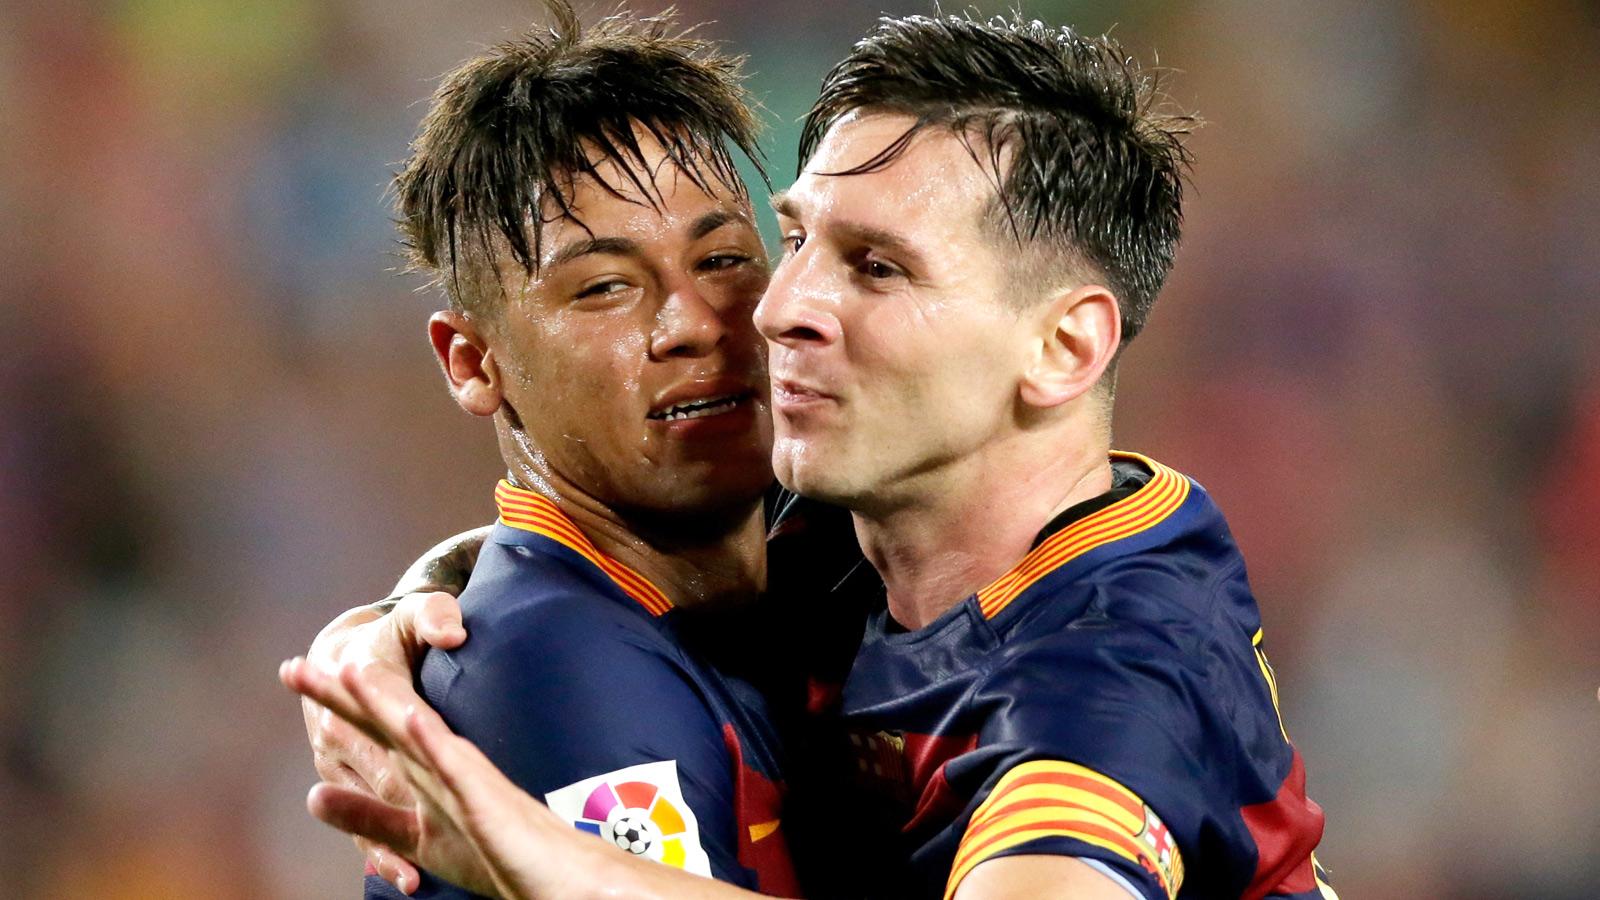 Manchester United, City battle for Barcelona's Messi, Neymar